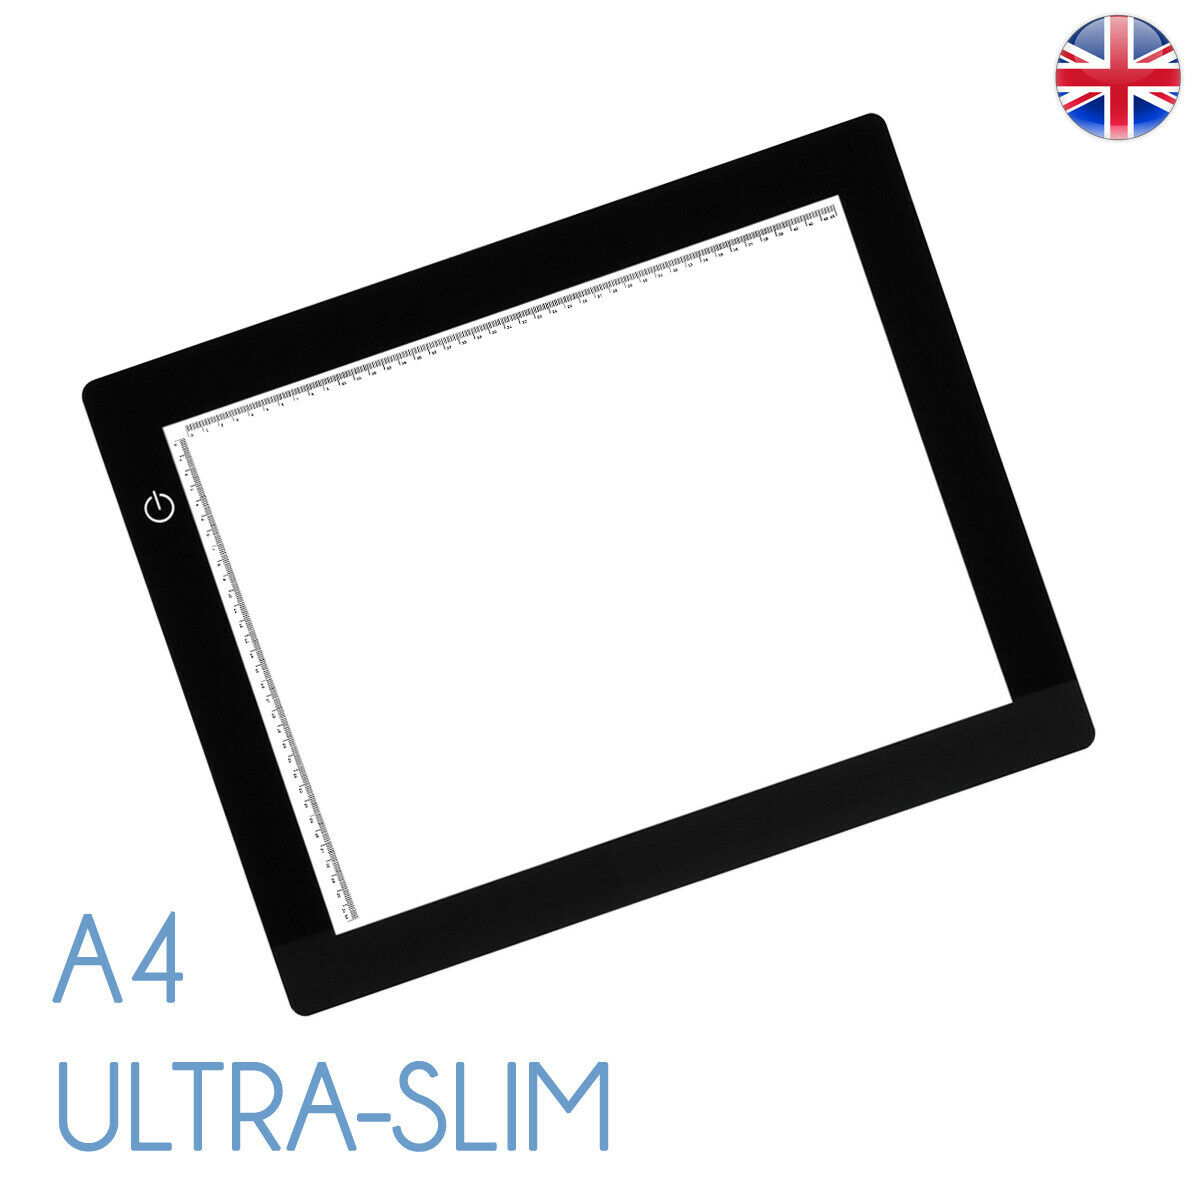 A4 LED Ultra Slim Light Box Dimmable Photographic 5600K Light Panel A4 Lightbox